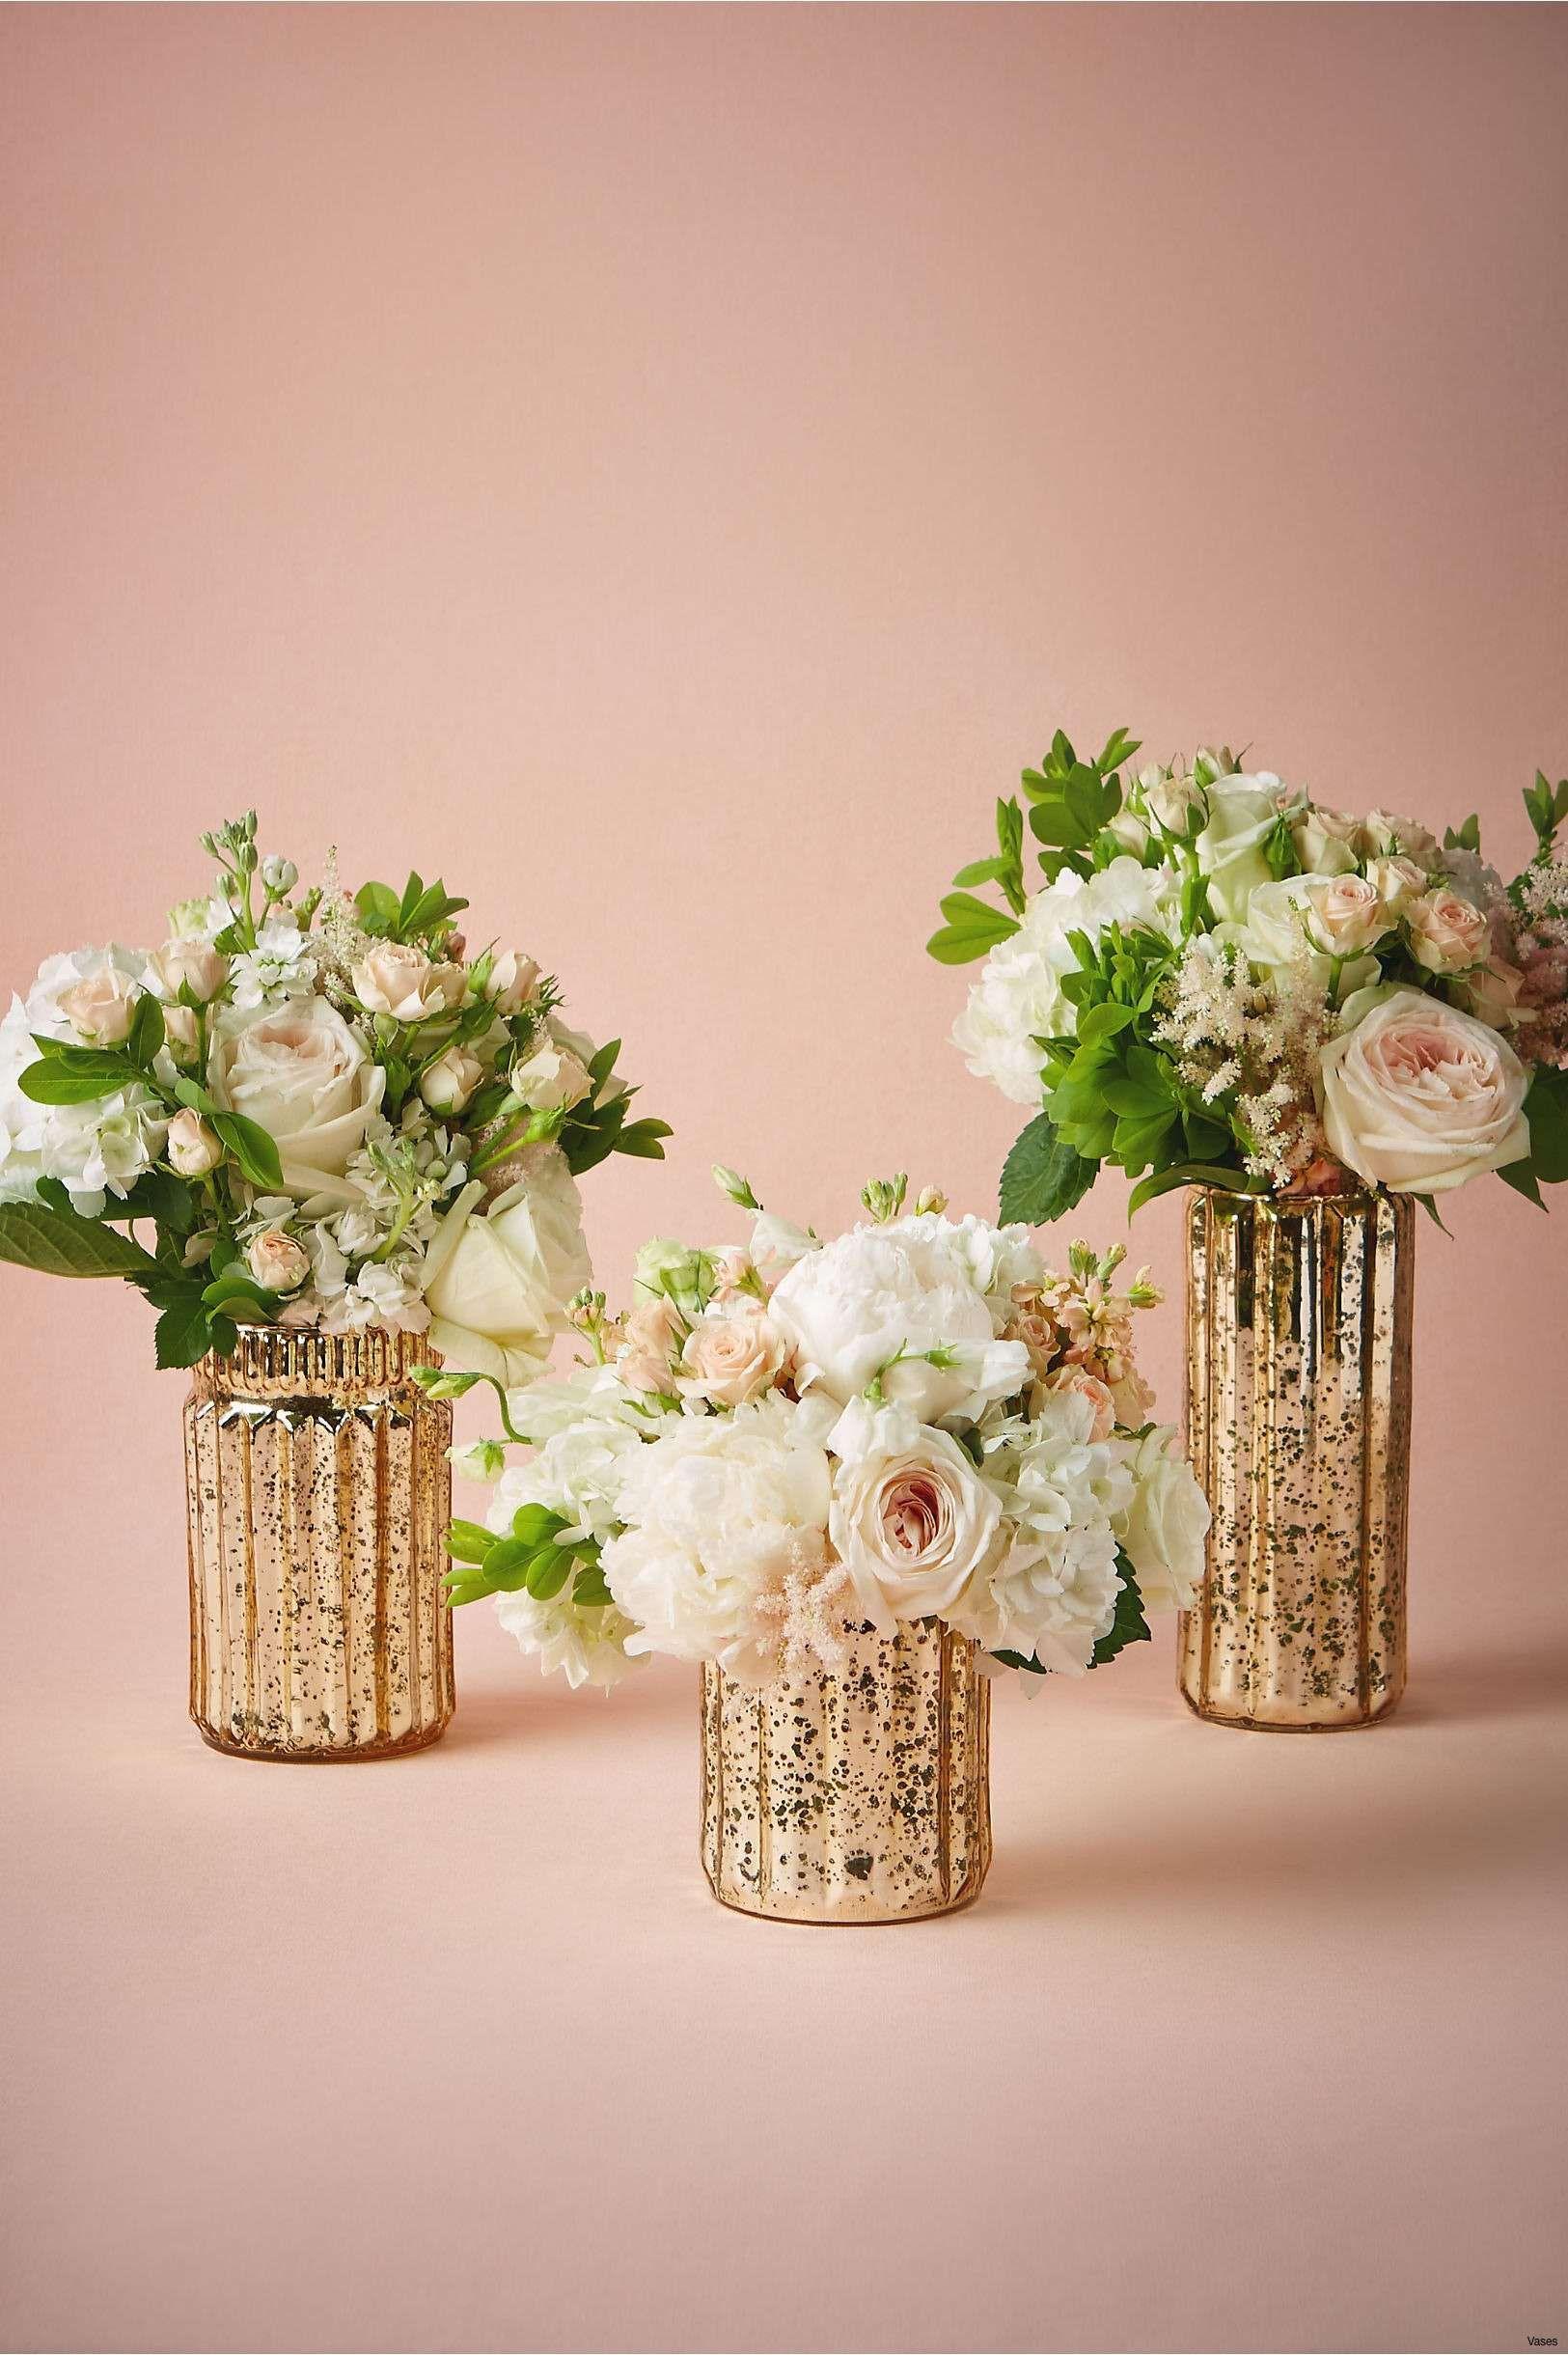 white flower vases for sale of 47 vase centerpiece ideas the weekly world in 6625 1h vases mercury glass cylinder vasesi 0d australia design